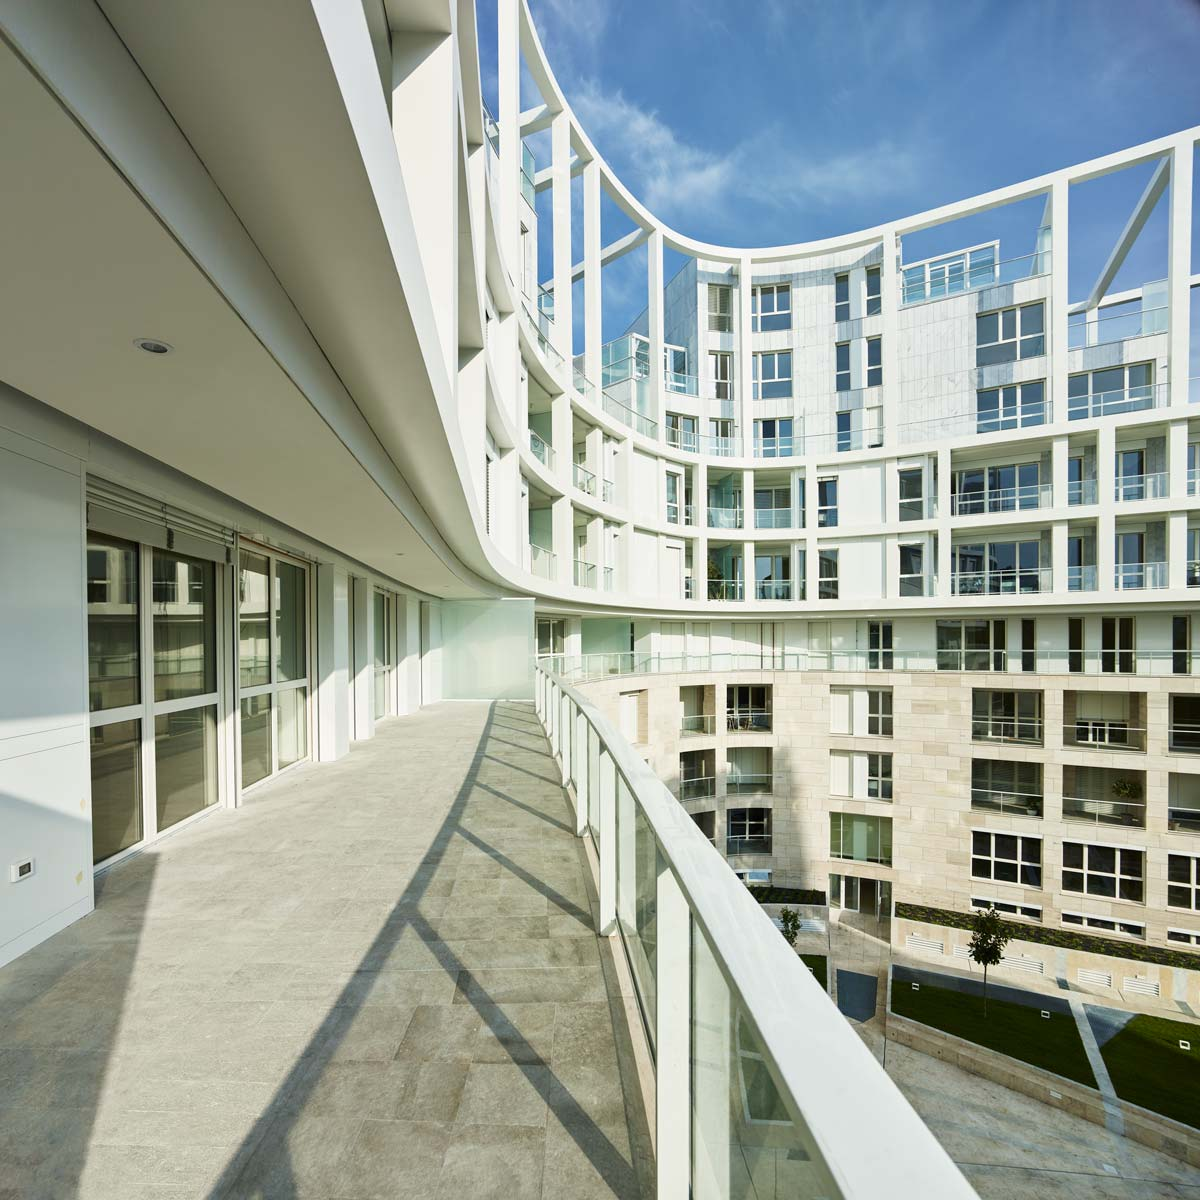 Degli-Esposti-Architetti-Milan-Residenze-Carlo-Erba-13